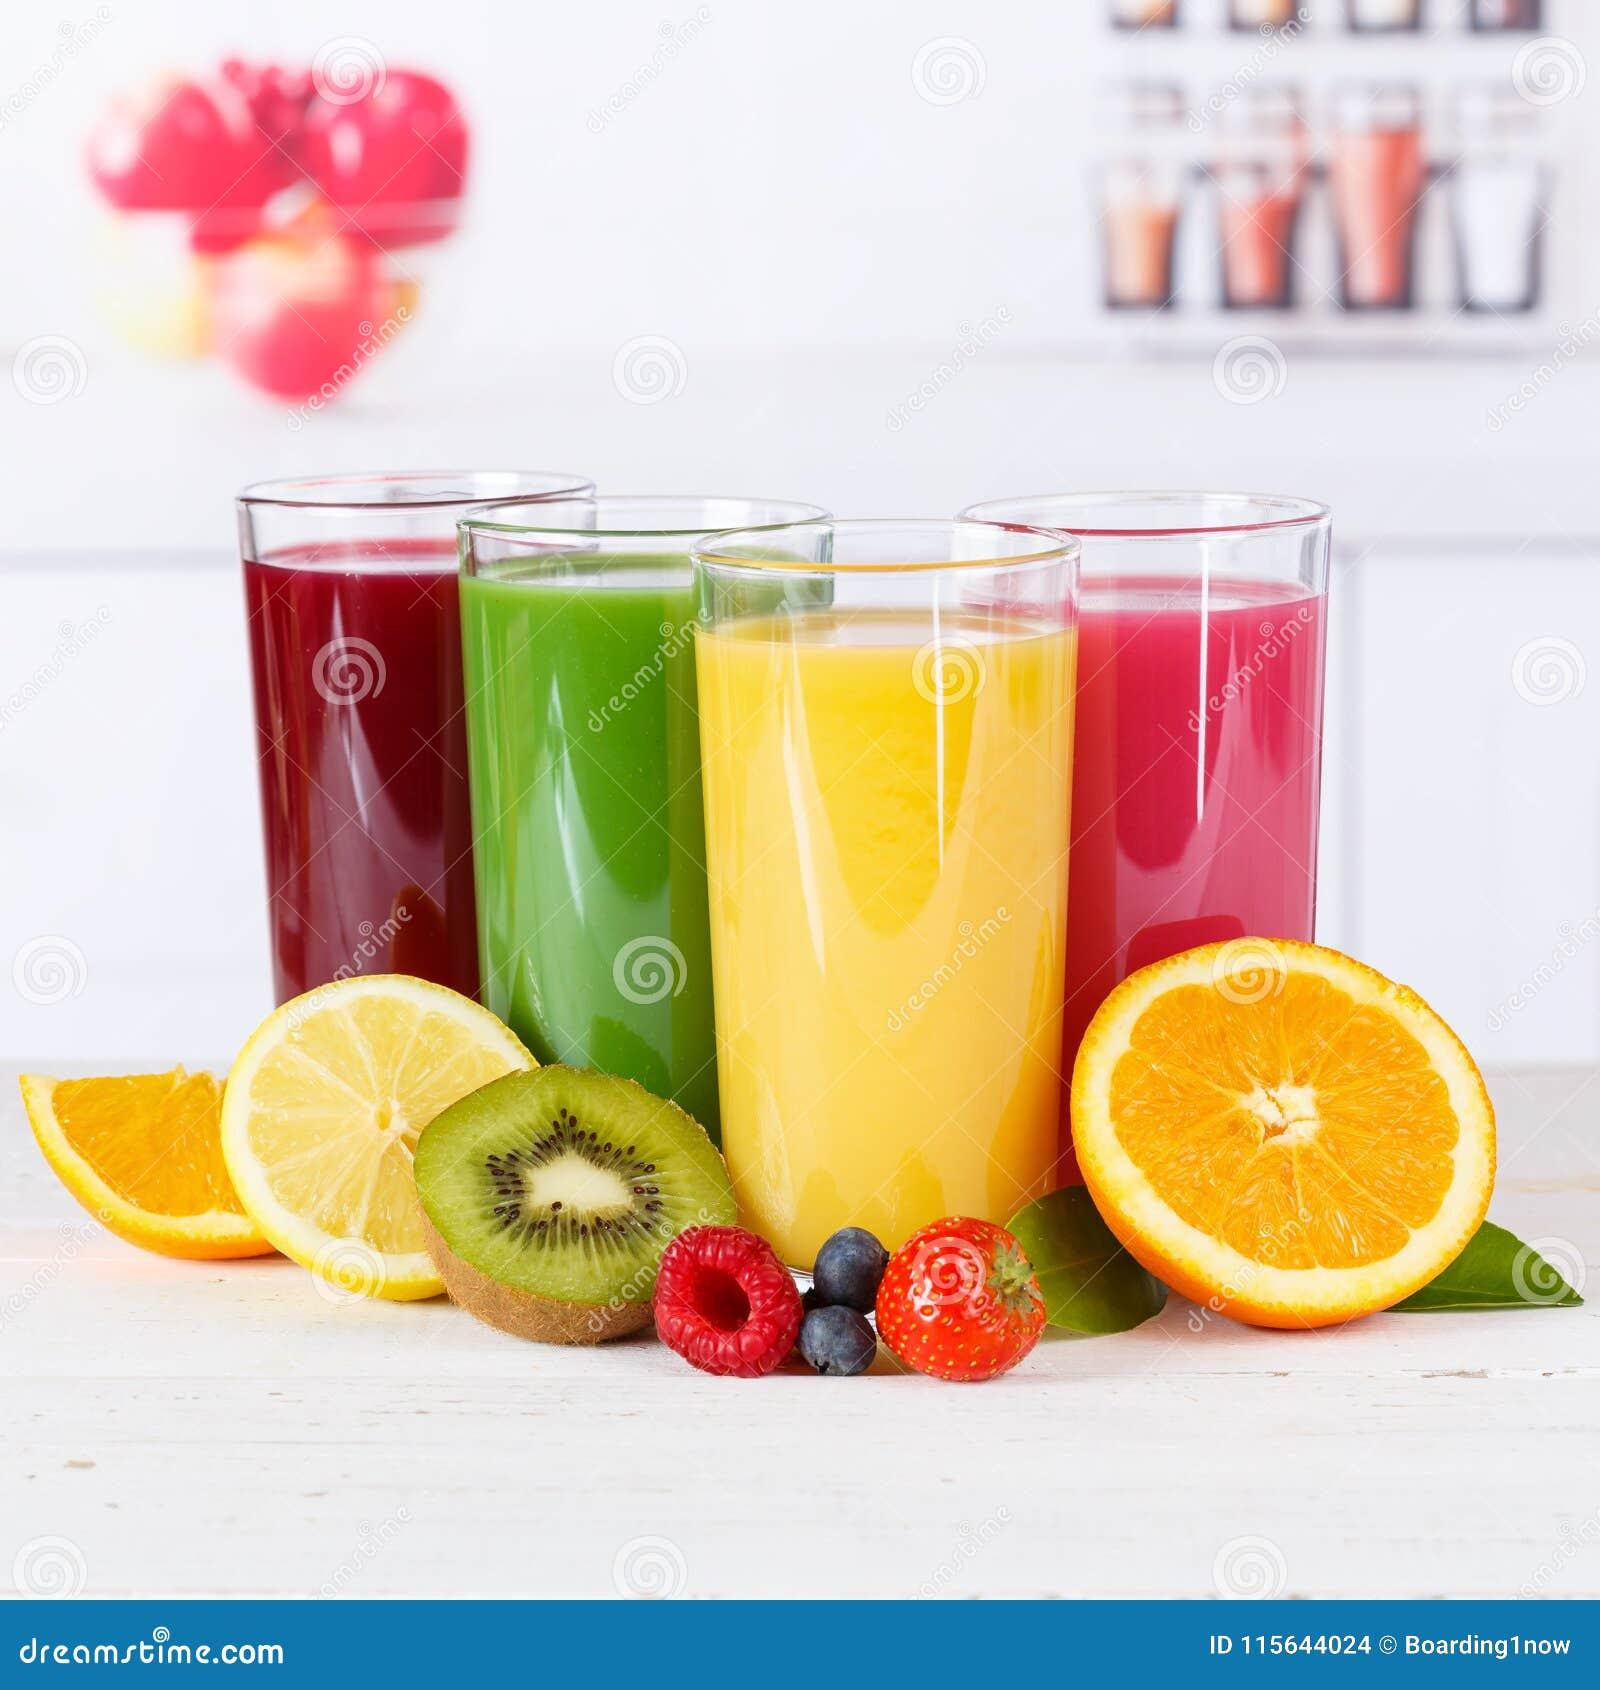 Juice smoothie smoothies orange oranges fruit fruits square heal